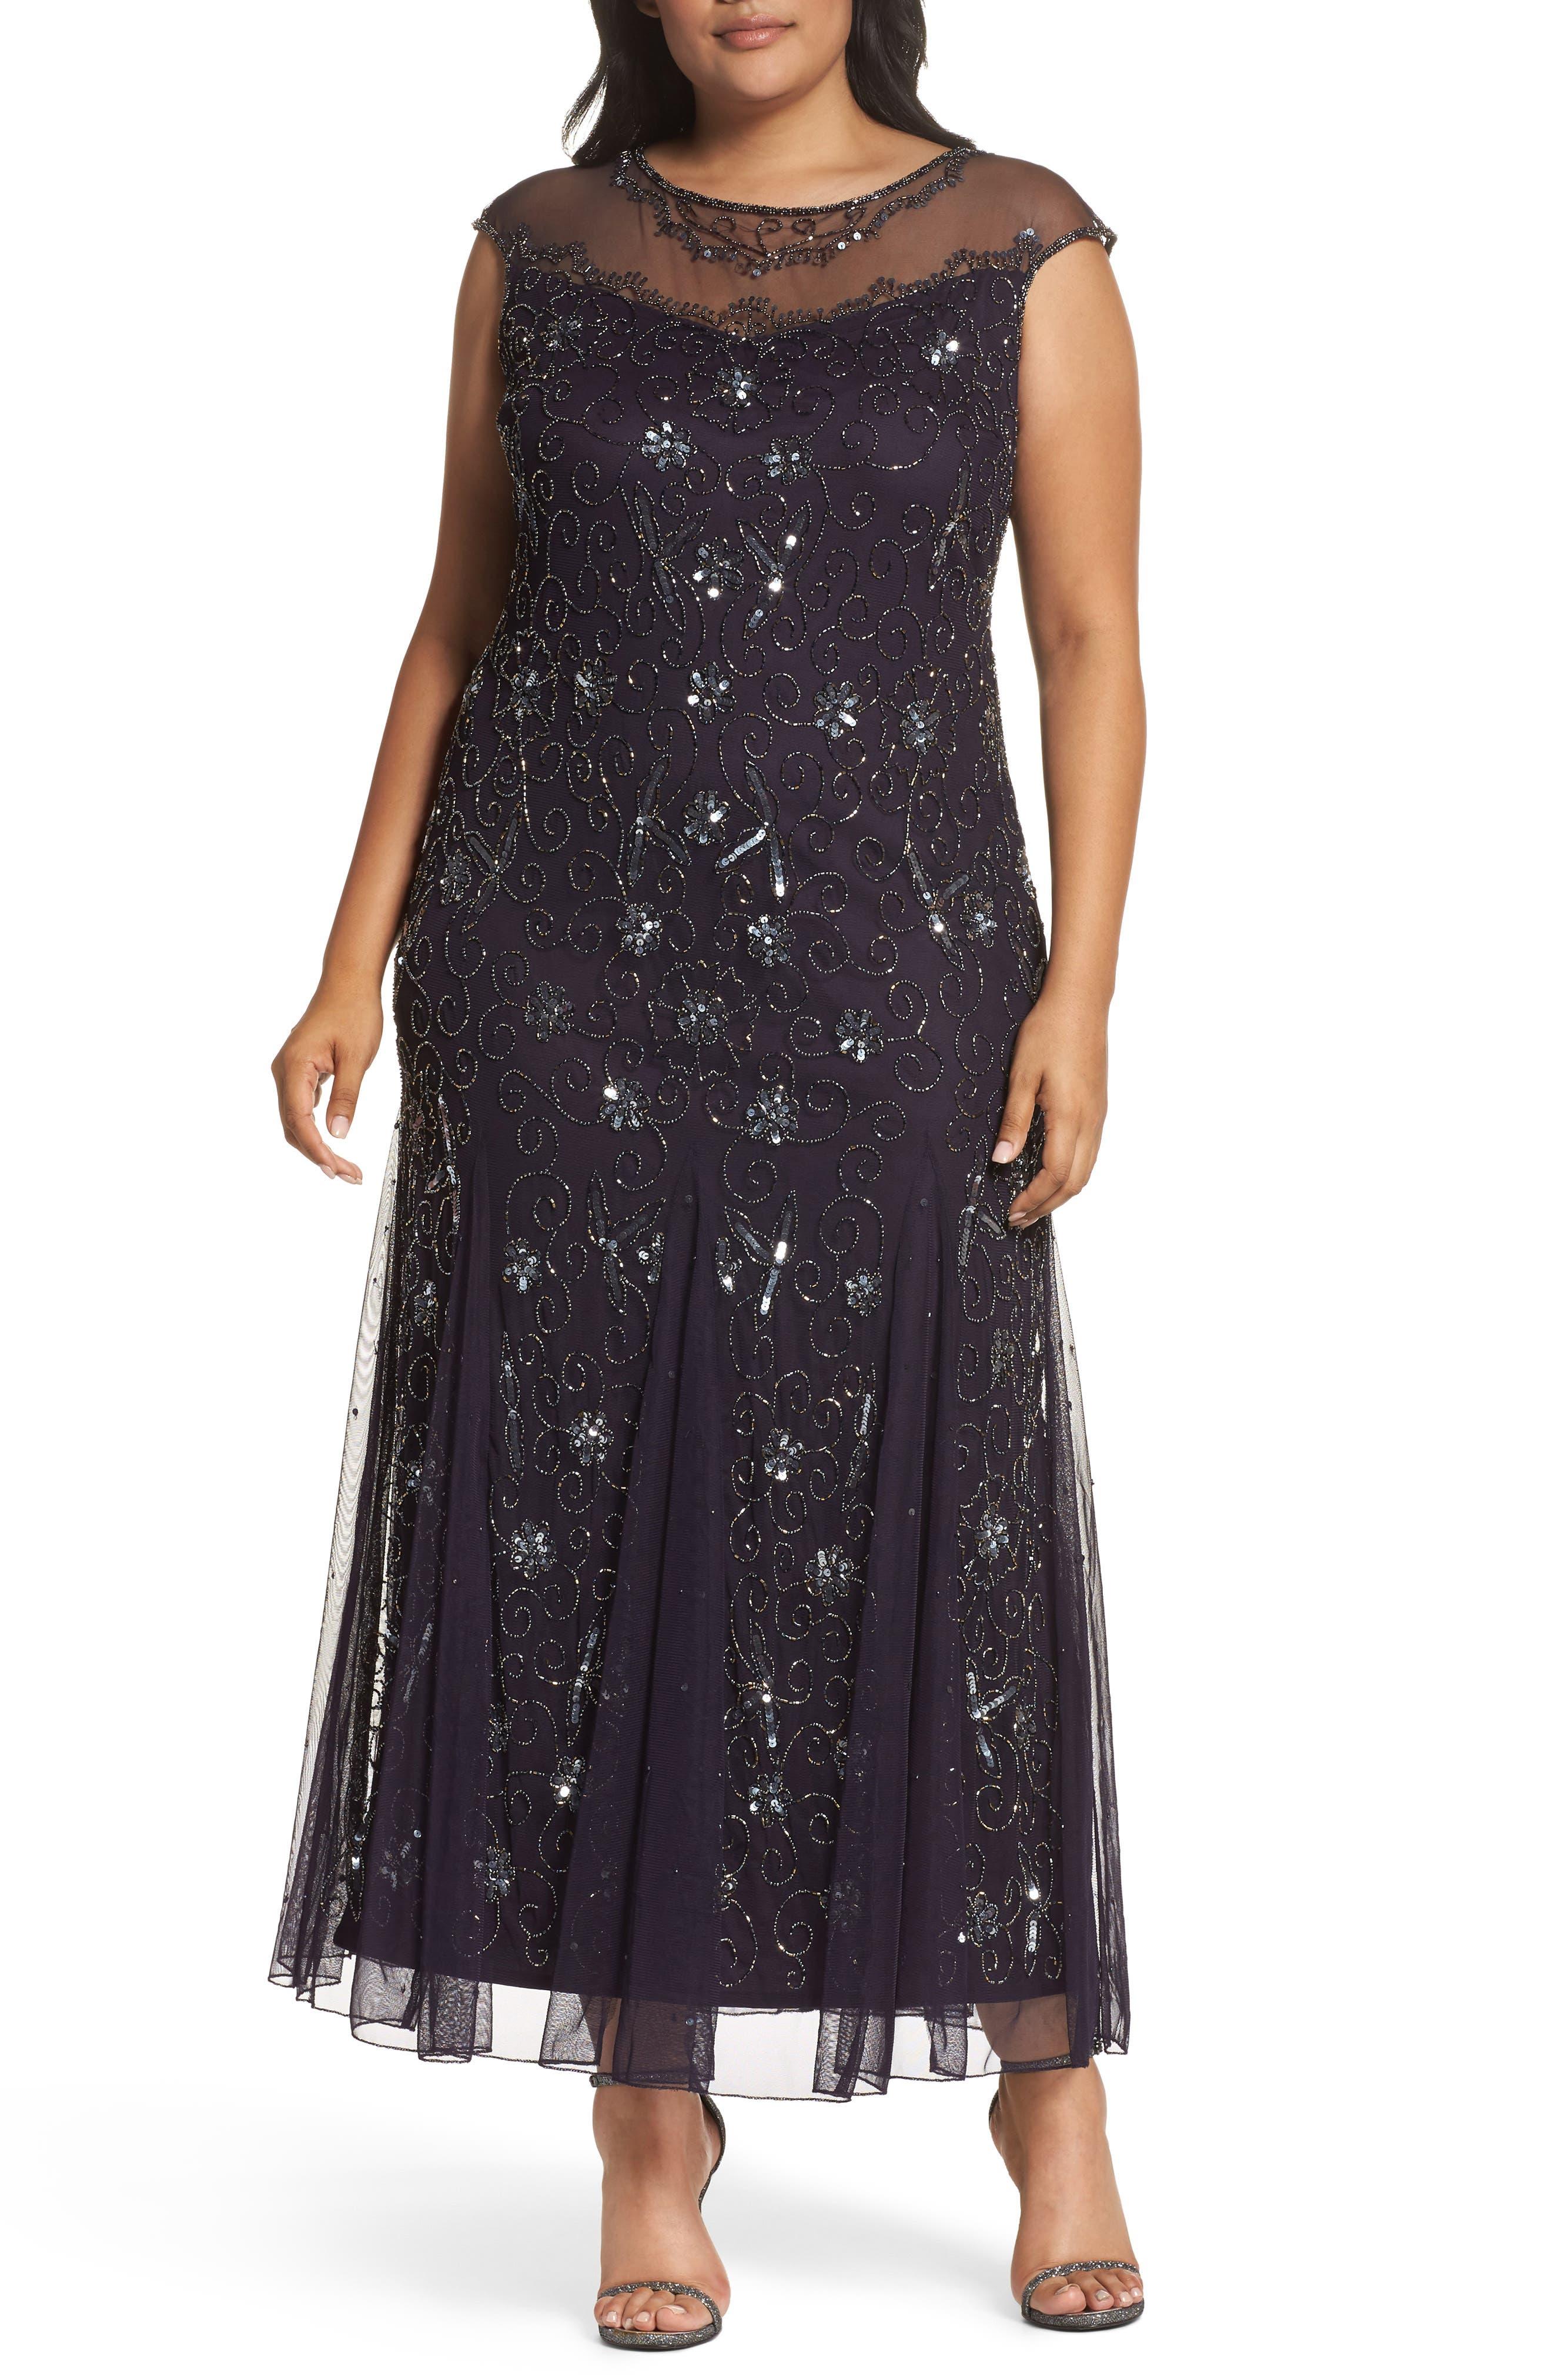 Alternate Image 1 Selected - Pisarro Nights Embellished Mesh Godet Gown (Plus Size)